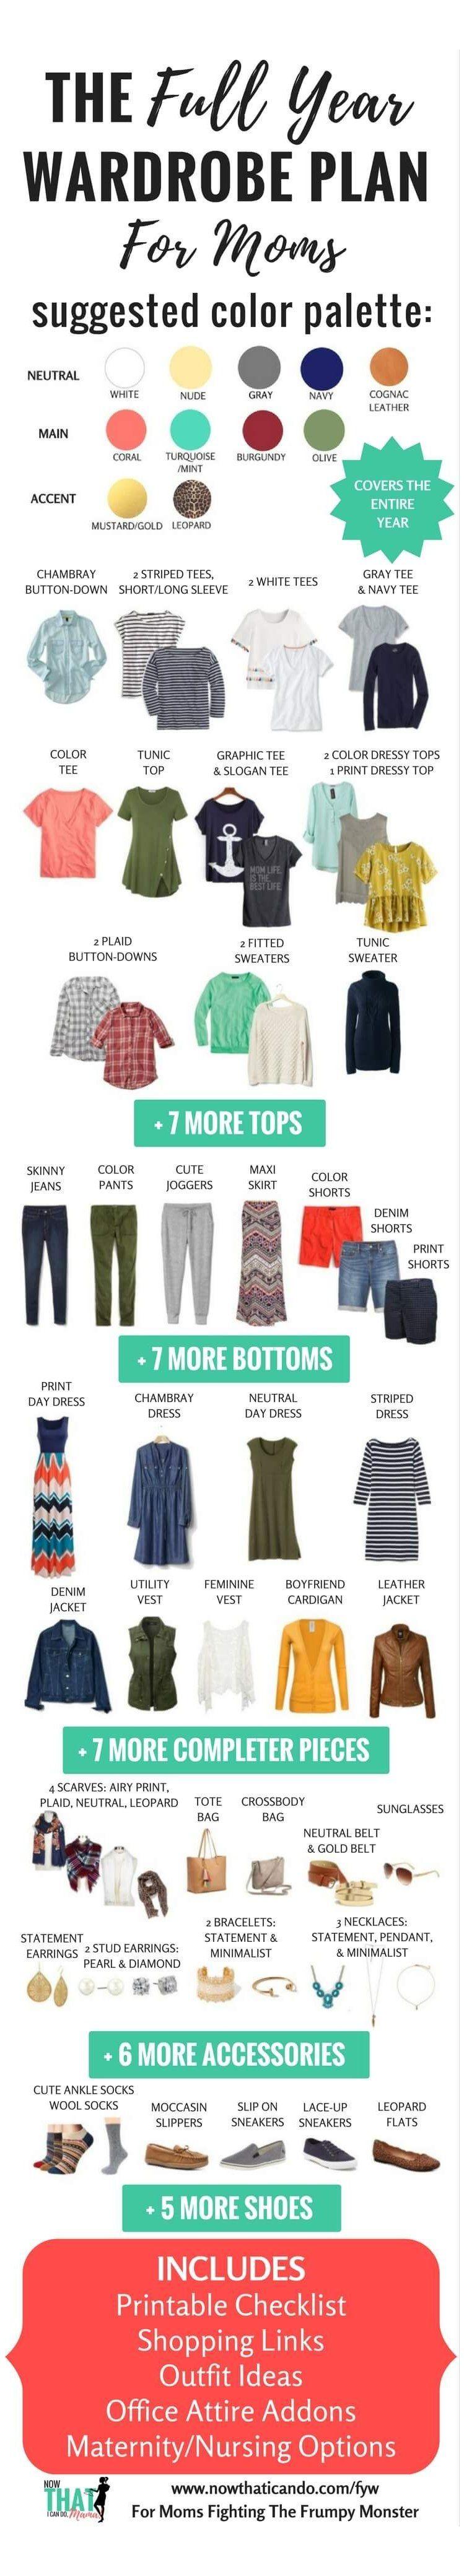 The Ultimate Mom Casual Capsule Wardrobe Plan (printable checklist) + How to Build a Wardrobe